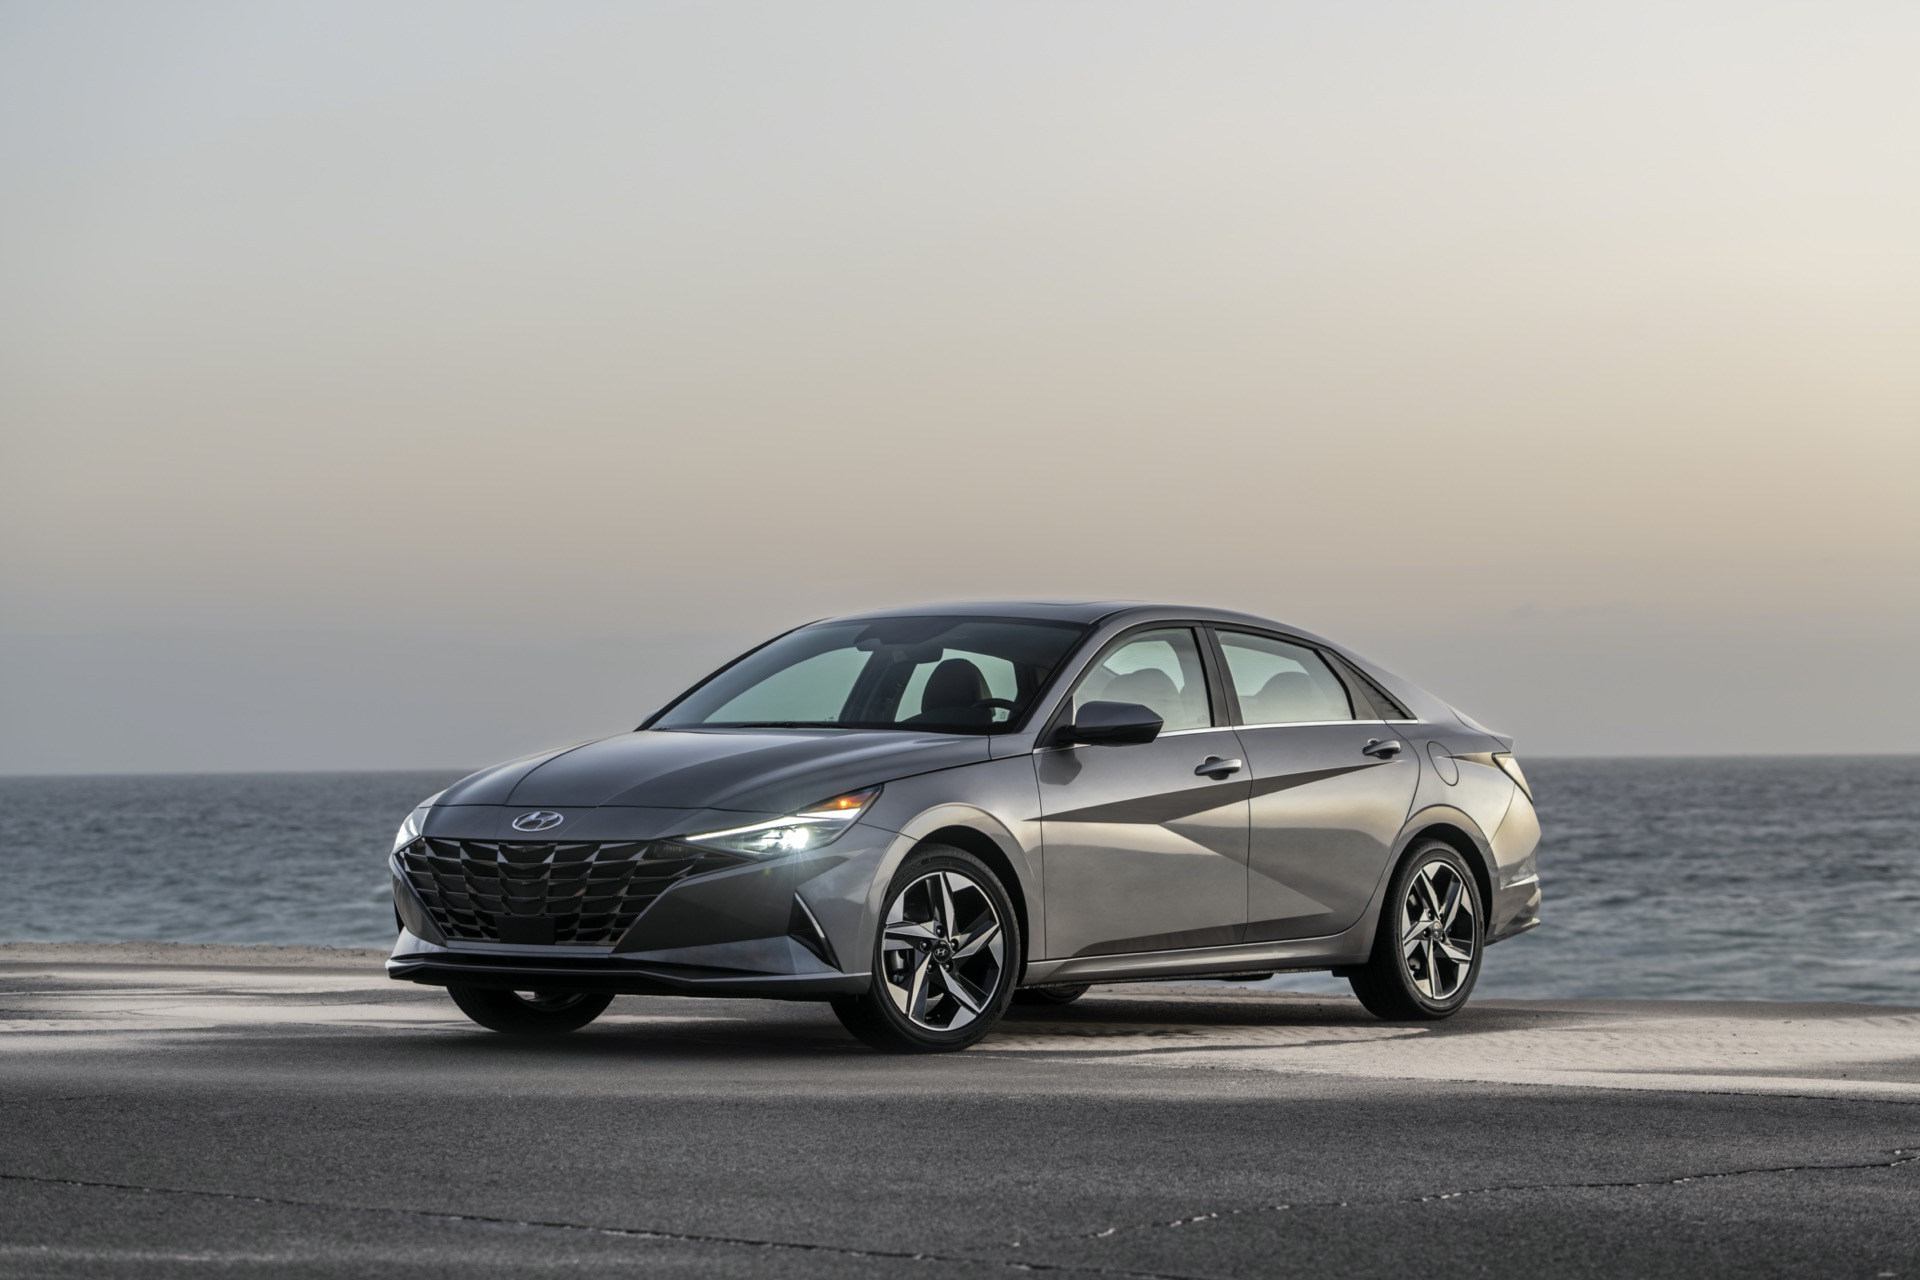 When to expect september 2021. Hyundai Elantra Hybrid Best Economy Car To Buy 2021